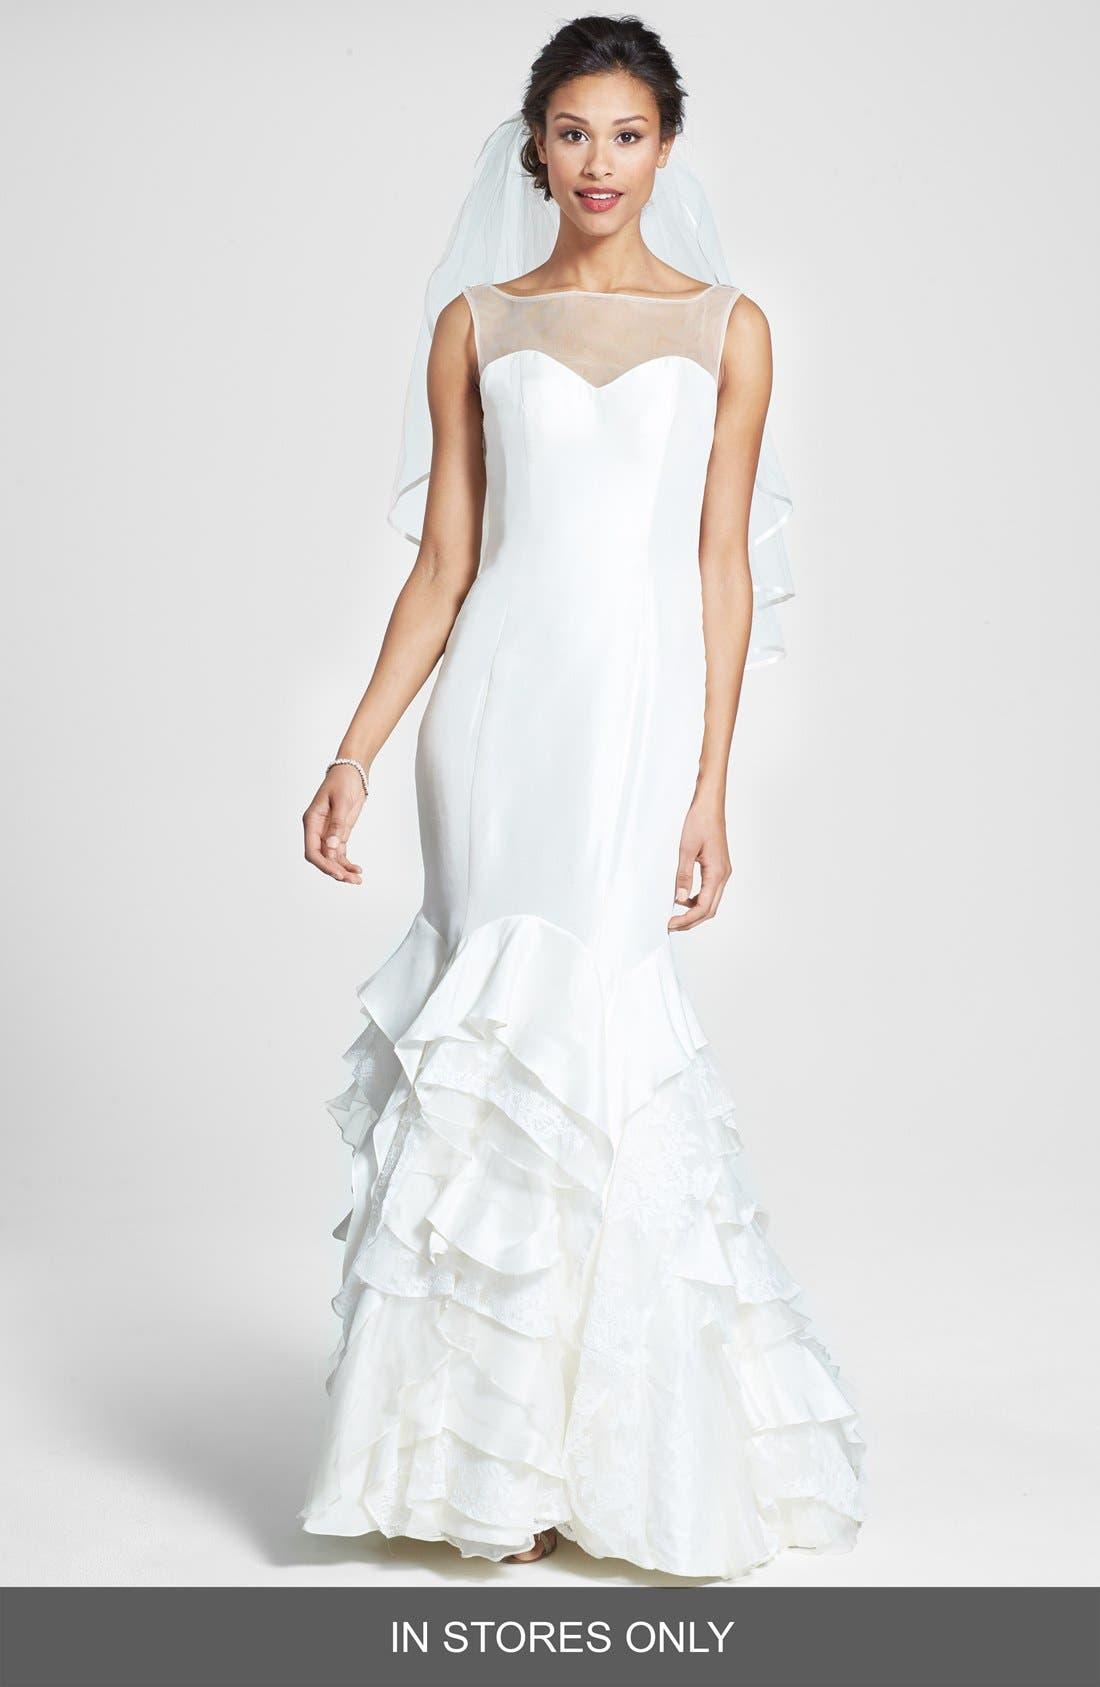 Main Image - Olia Zavozina 'Emma' Lace Inset Ruffled Silk Shantung Mermaid Dress (In Stores Only)